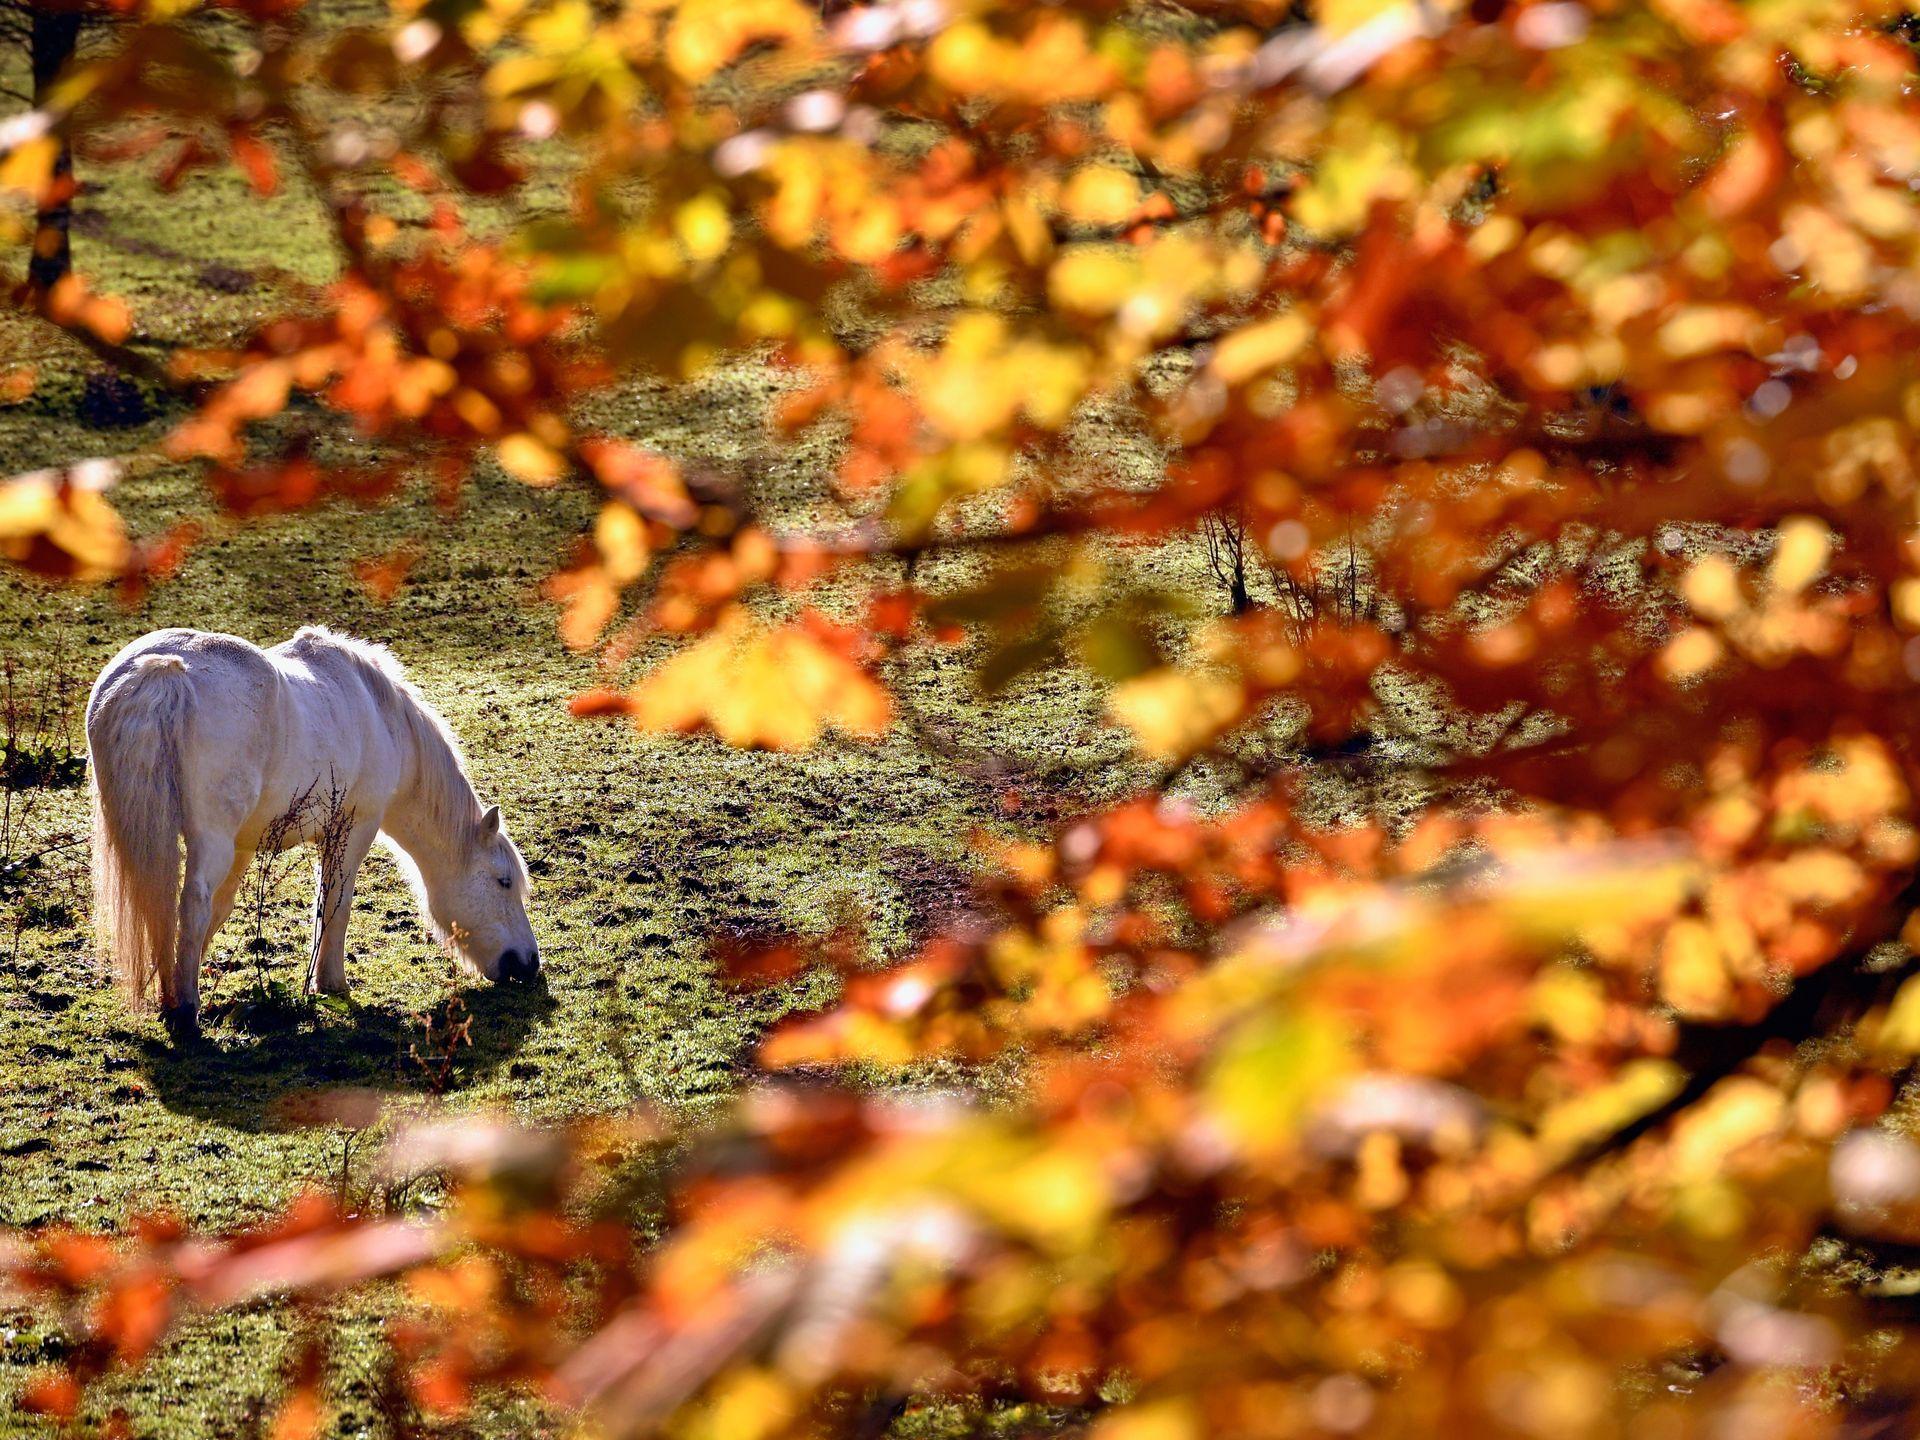 A pony grazes in the village of Strathyre  on Oct.